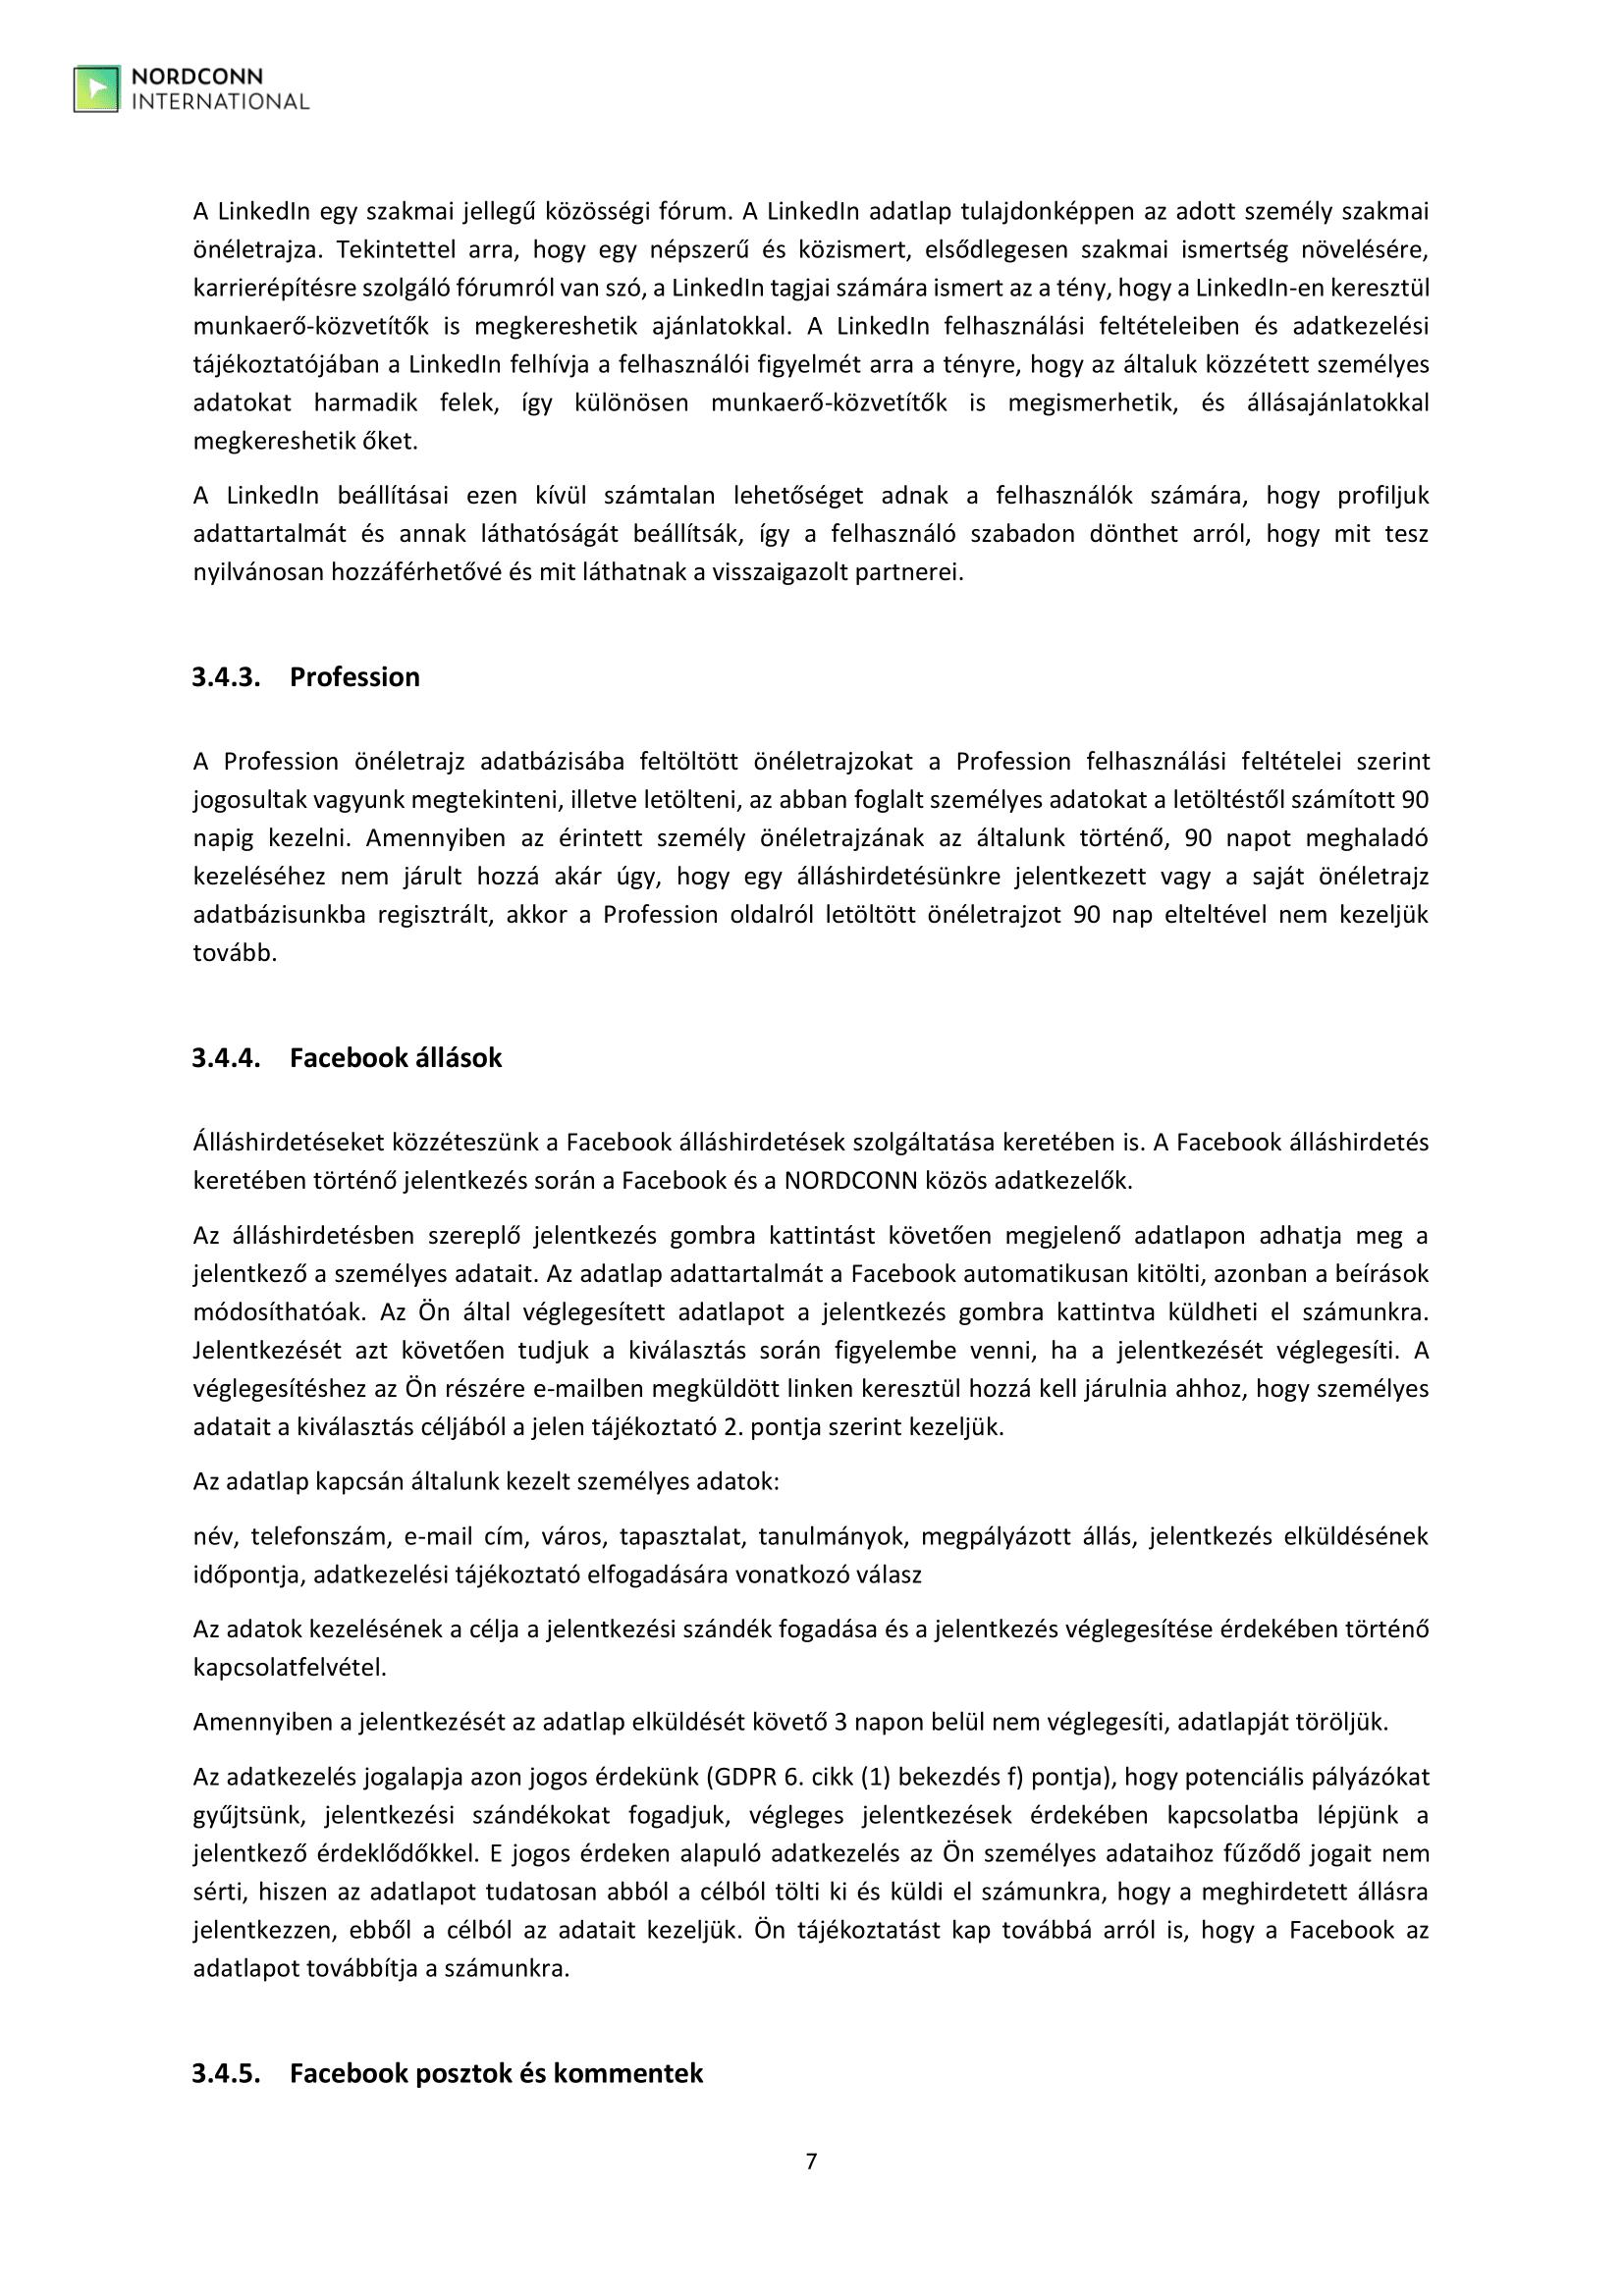 Adatkezelesi_07